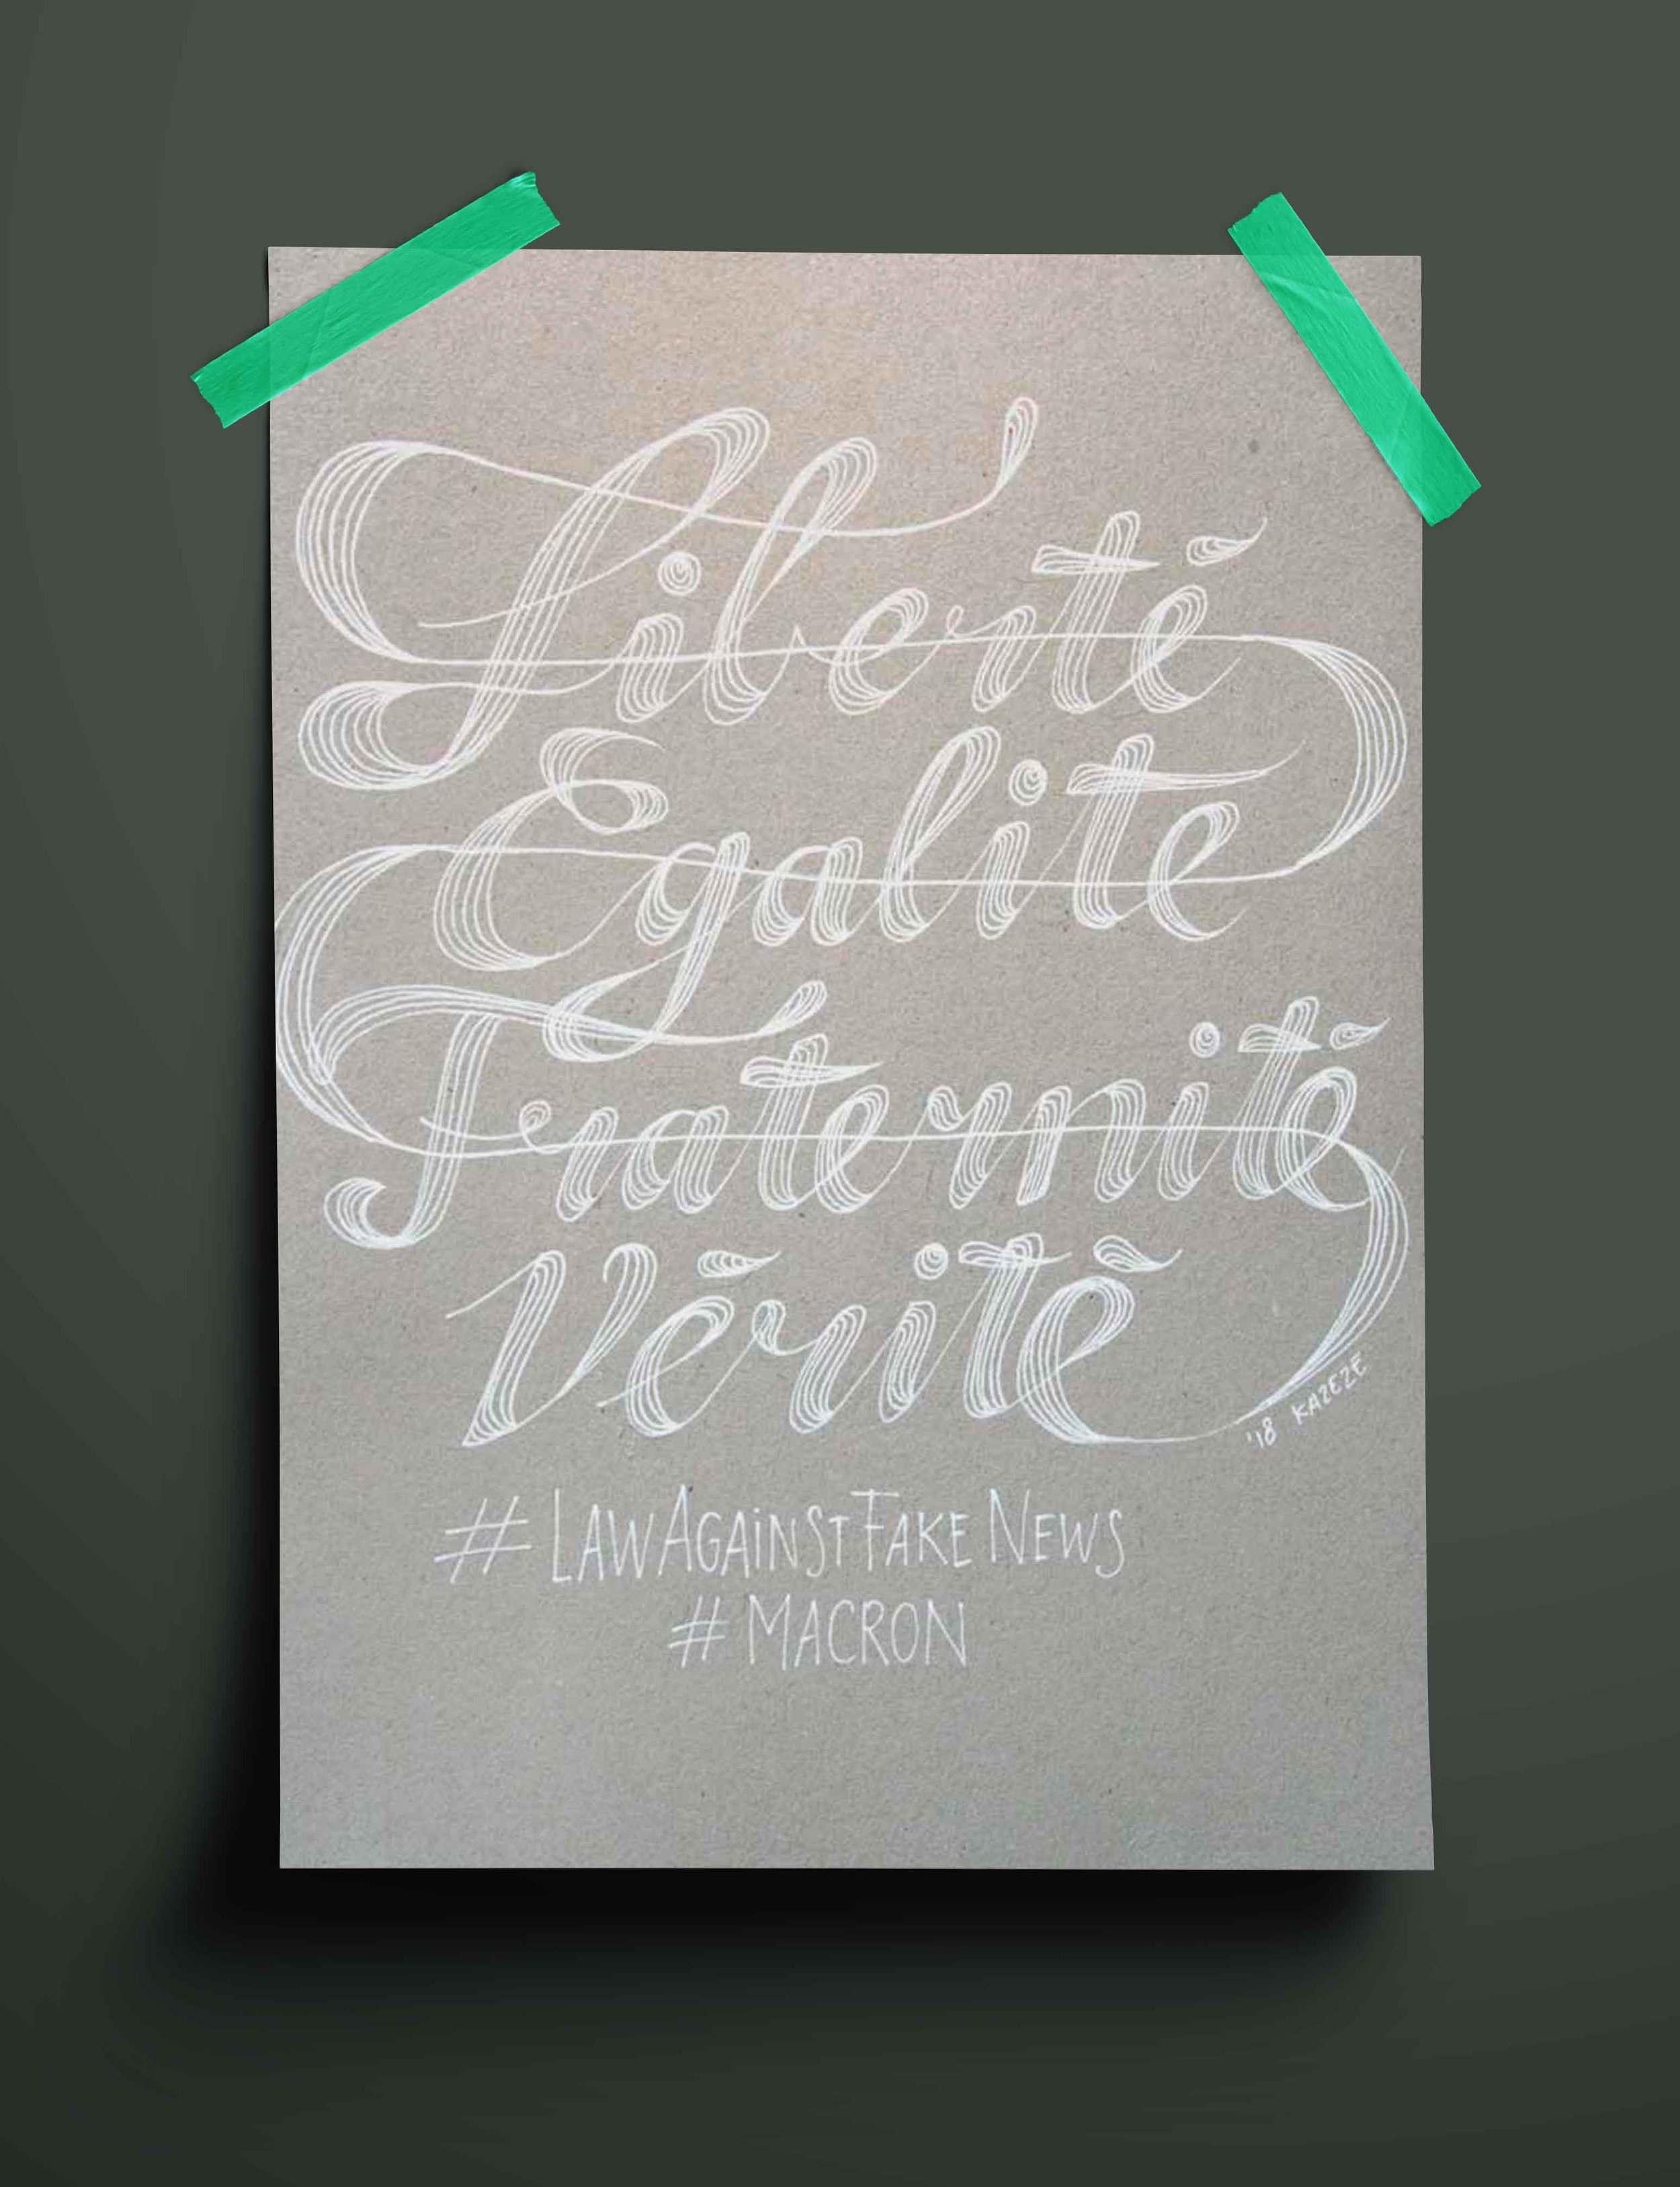 kAZEZE-hand-drawntype-handgetekende-letters-amsterdam-LIBERTE_mockup1.jpg